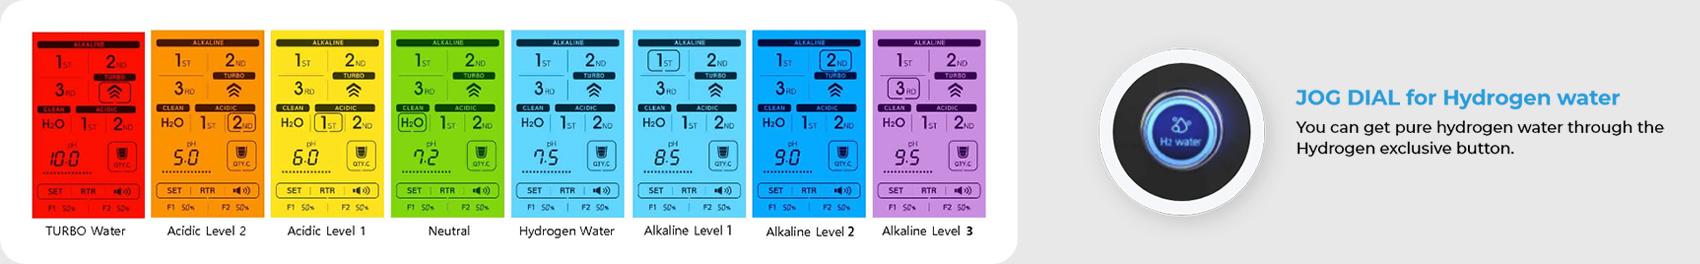 JOG DIAL for Hydrogen water